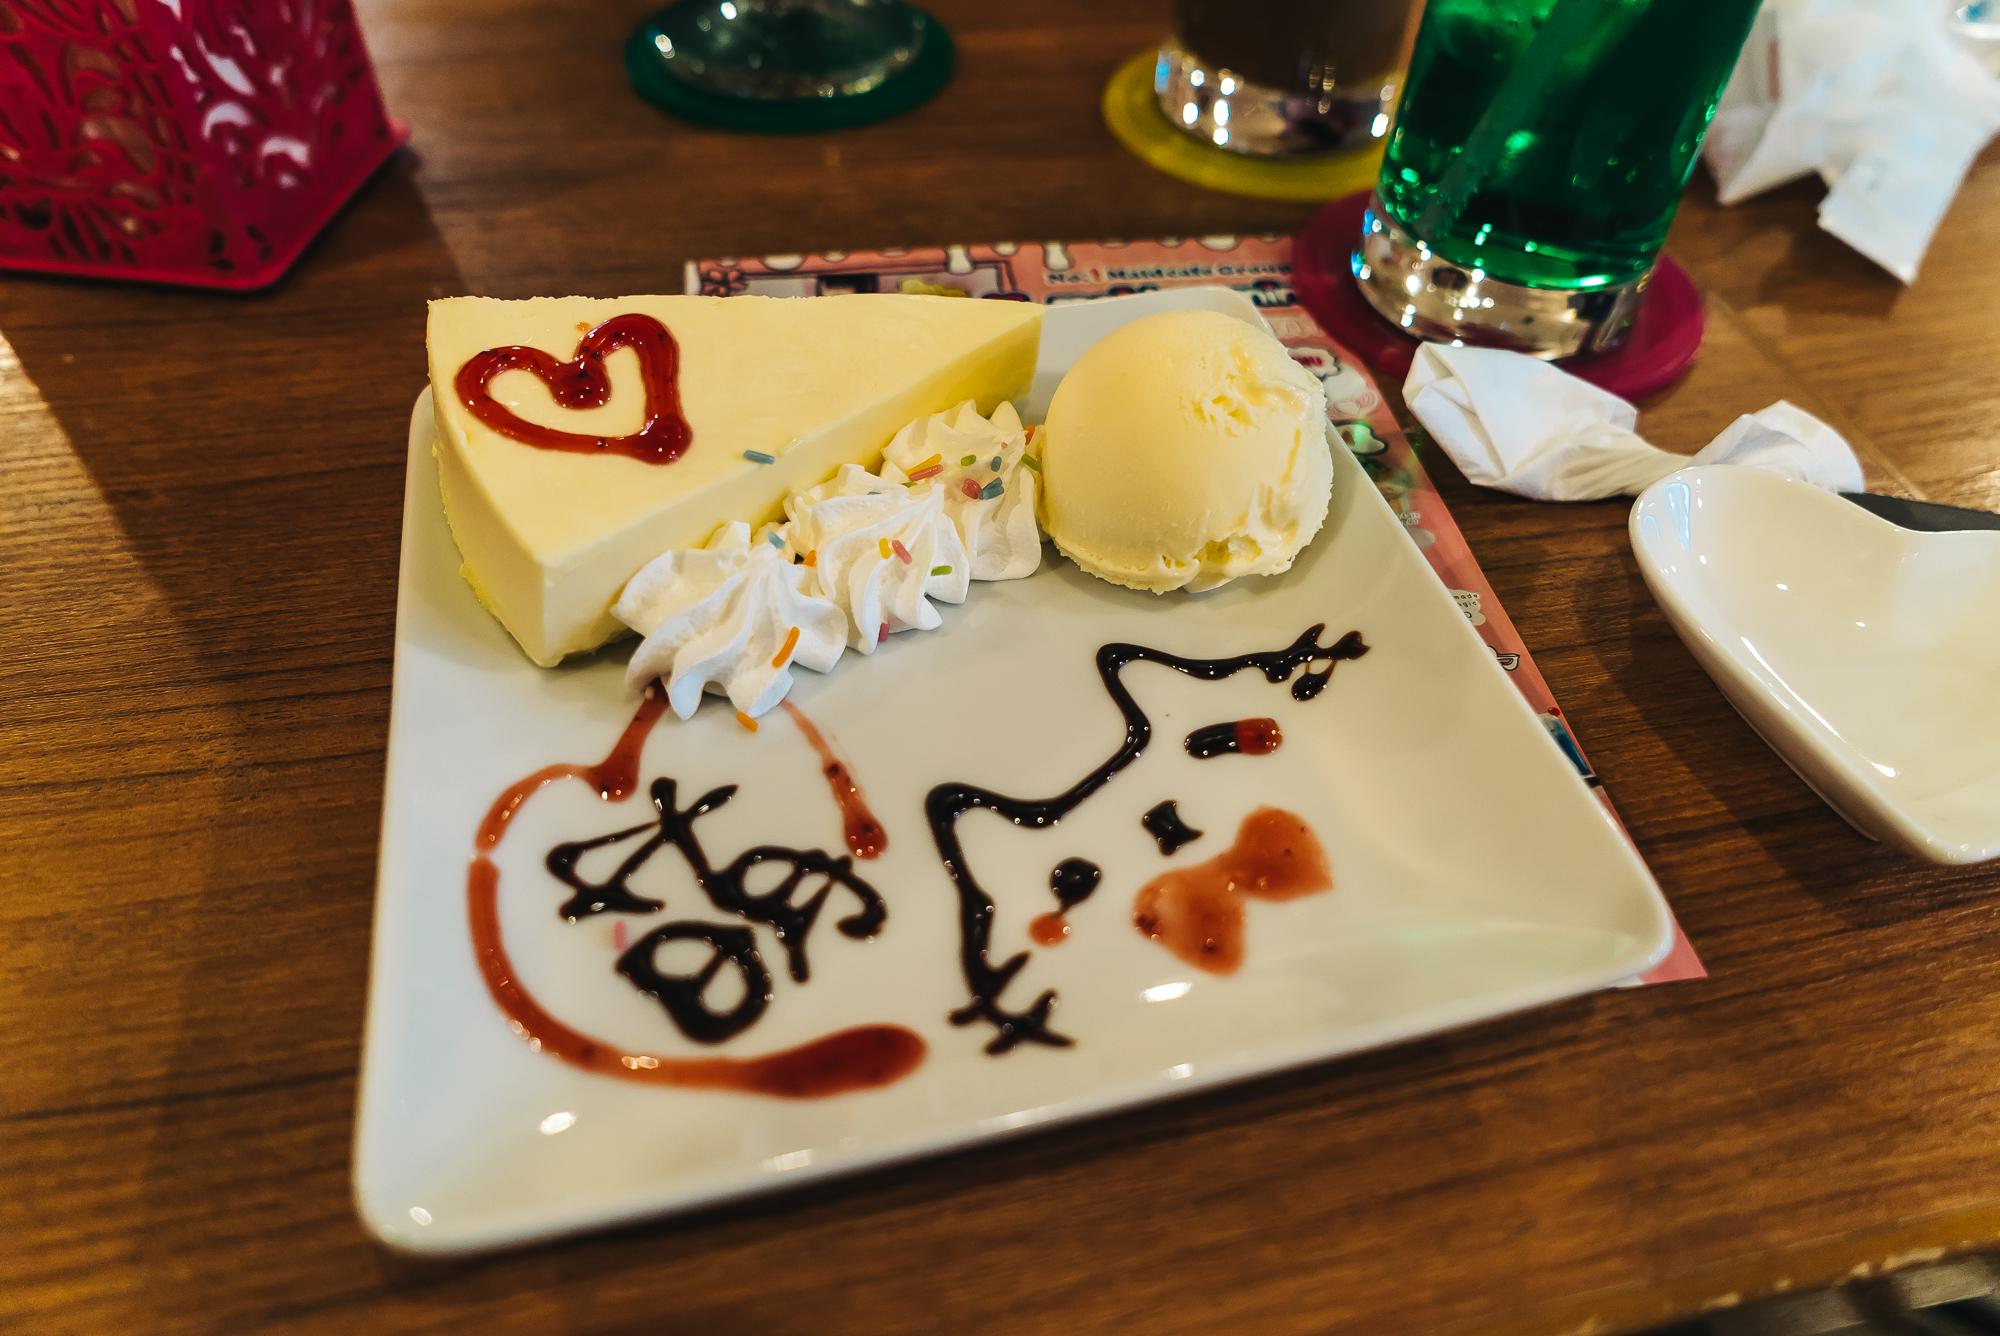 Our Awkward Experience At The Maid Cafe In Akihabara Japan Travel Pockets